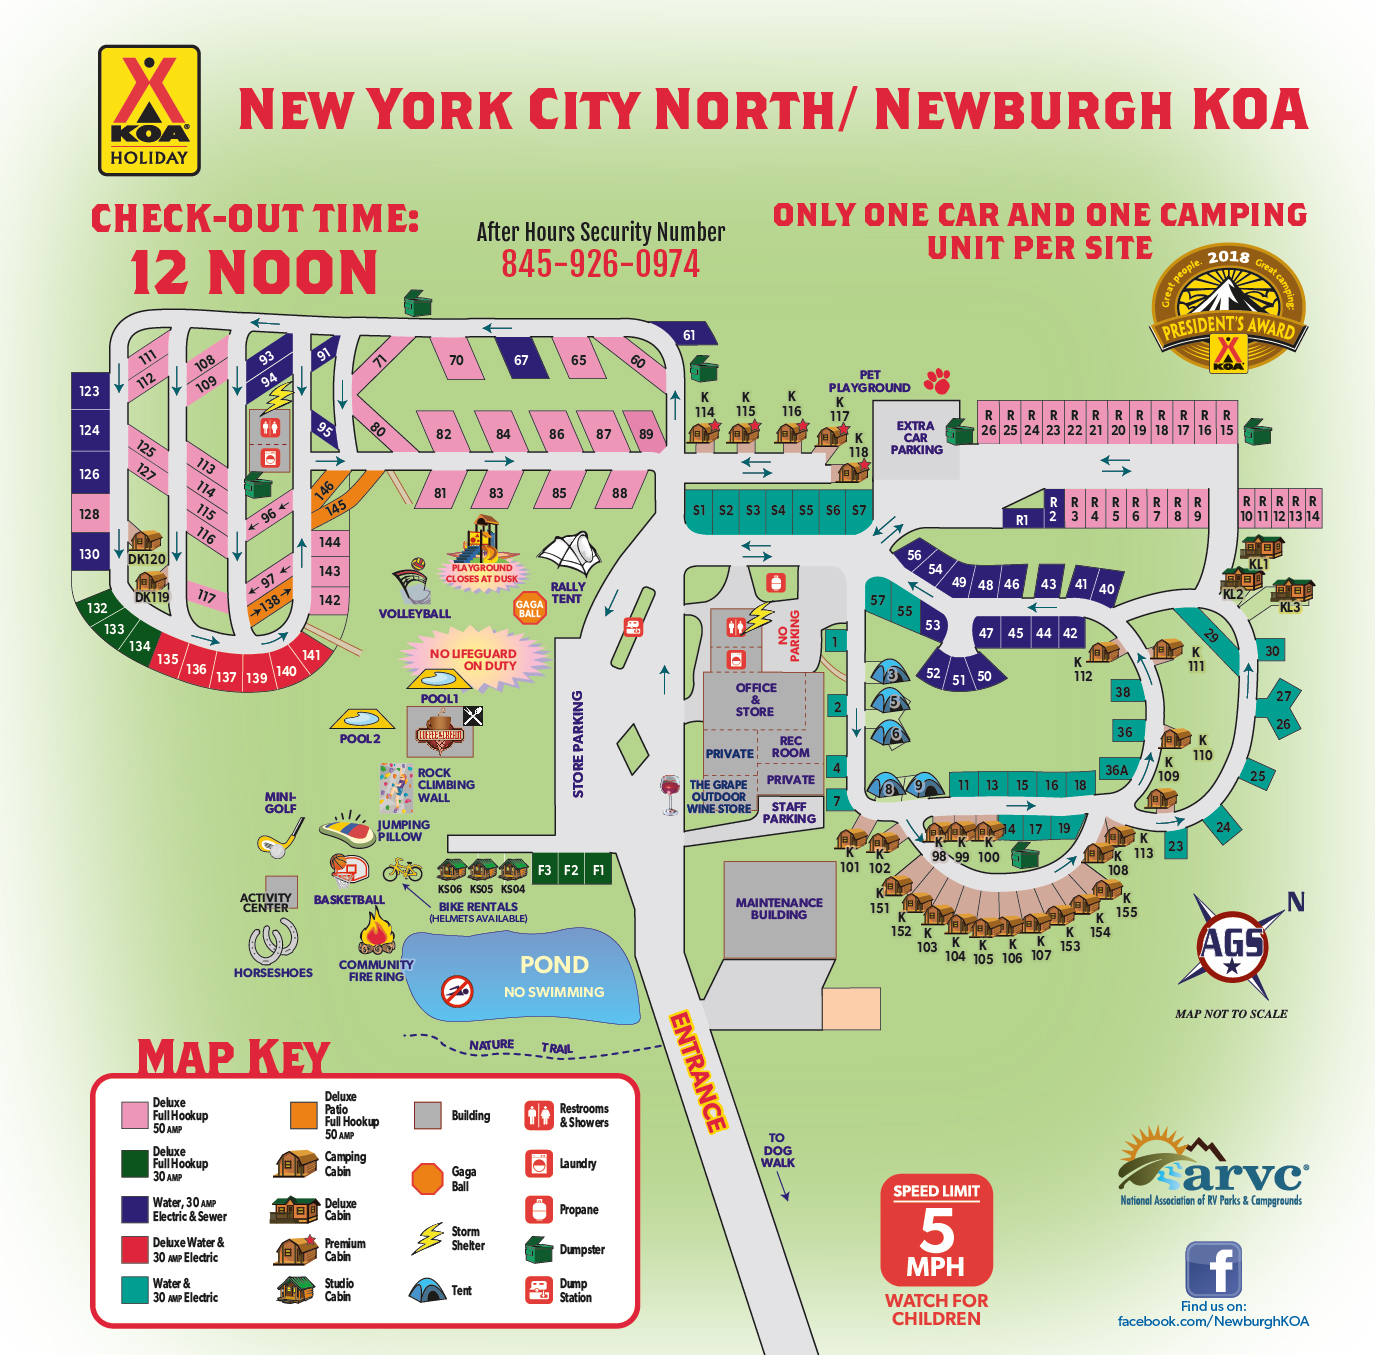 Experience Sitemap: New York City North / Newburgh KOA